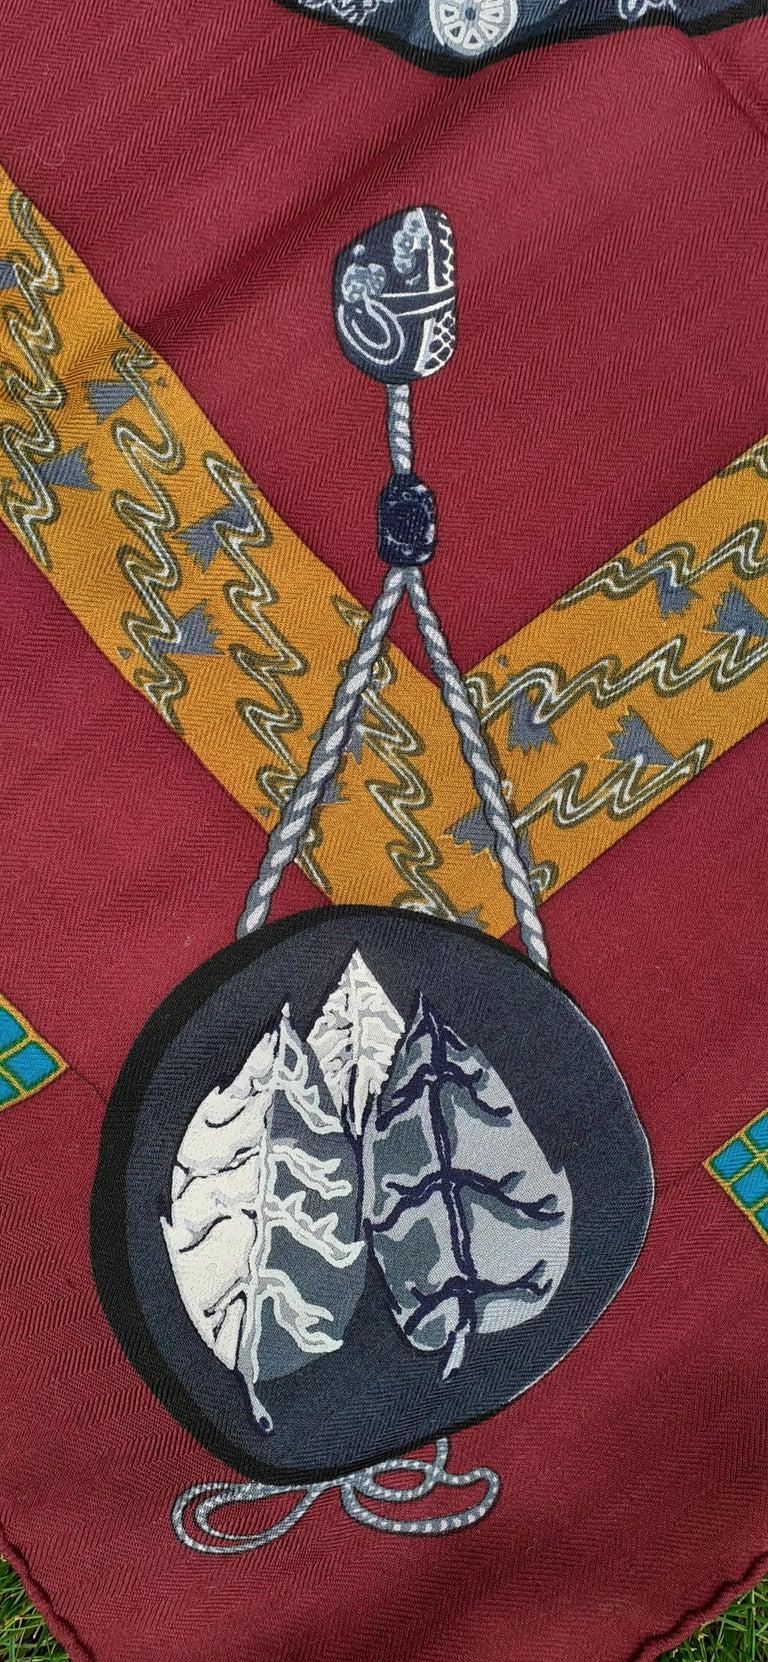 Hermès Shawl Scarf Kimonos et Inros Annie Faivre Cashmere Silk 54 inches For Sale 6